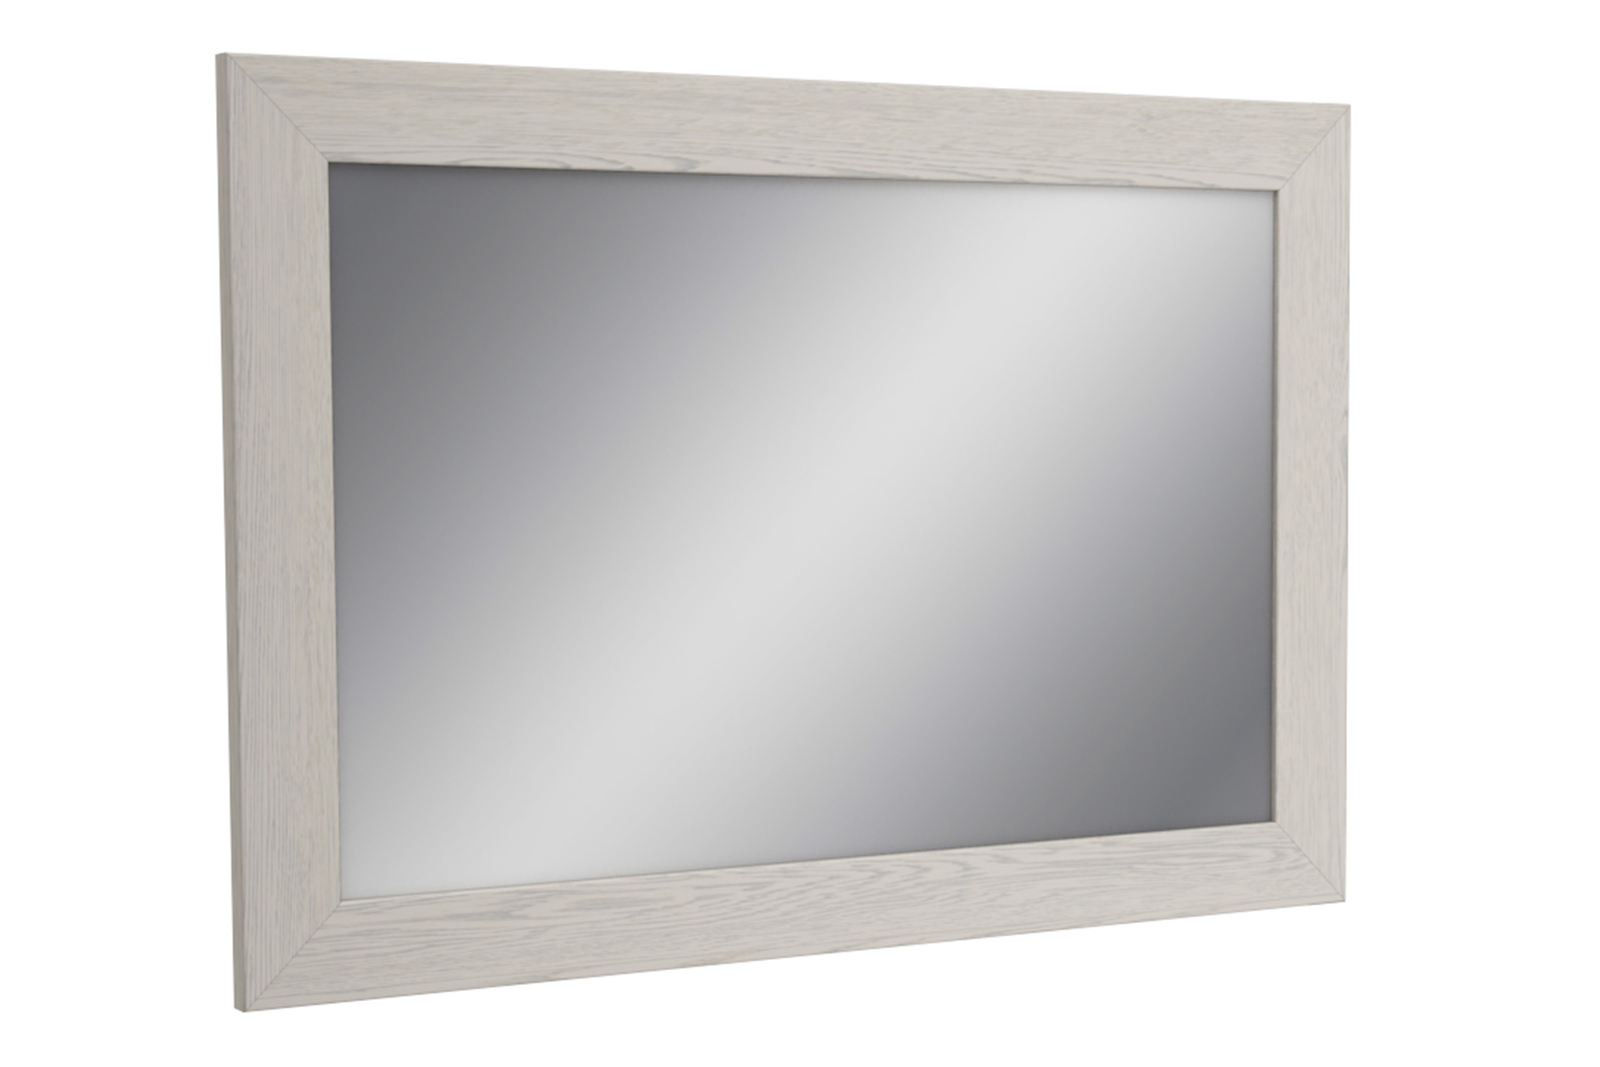 ������� ��������� HomeMe ���� AEW0079000